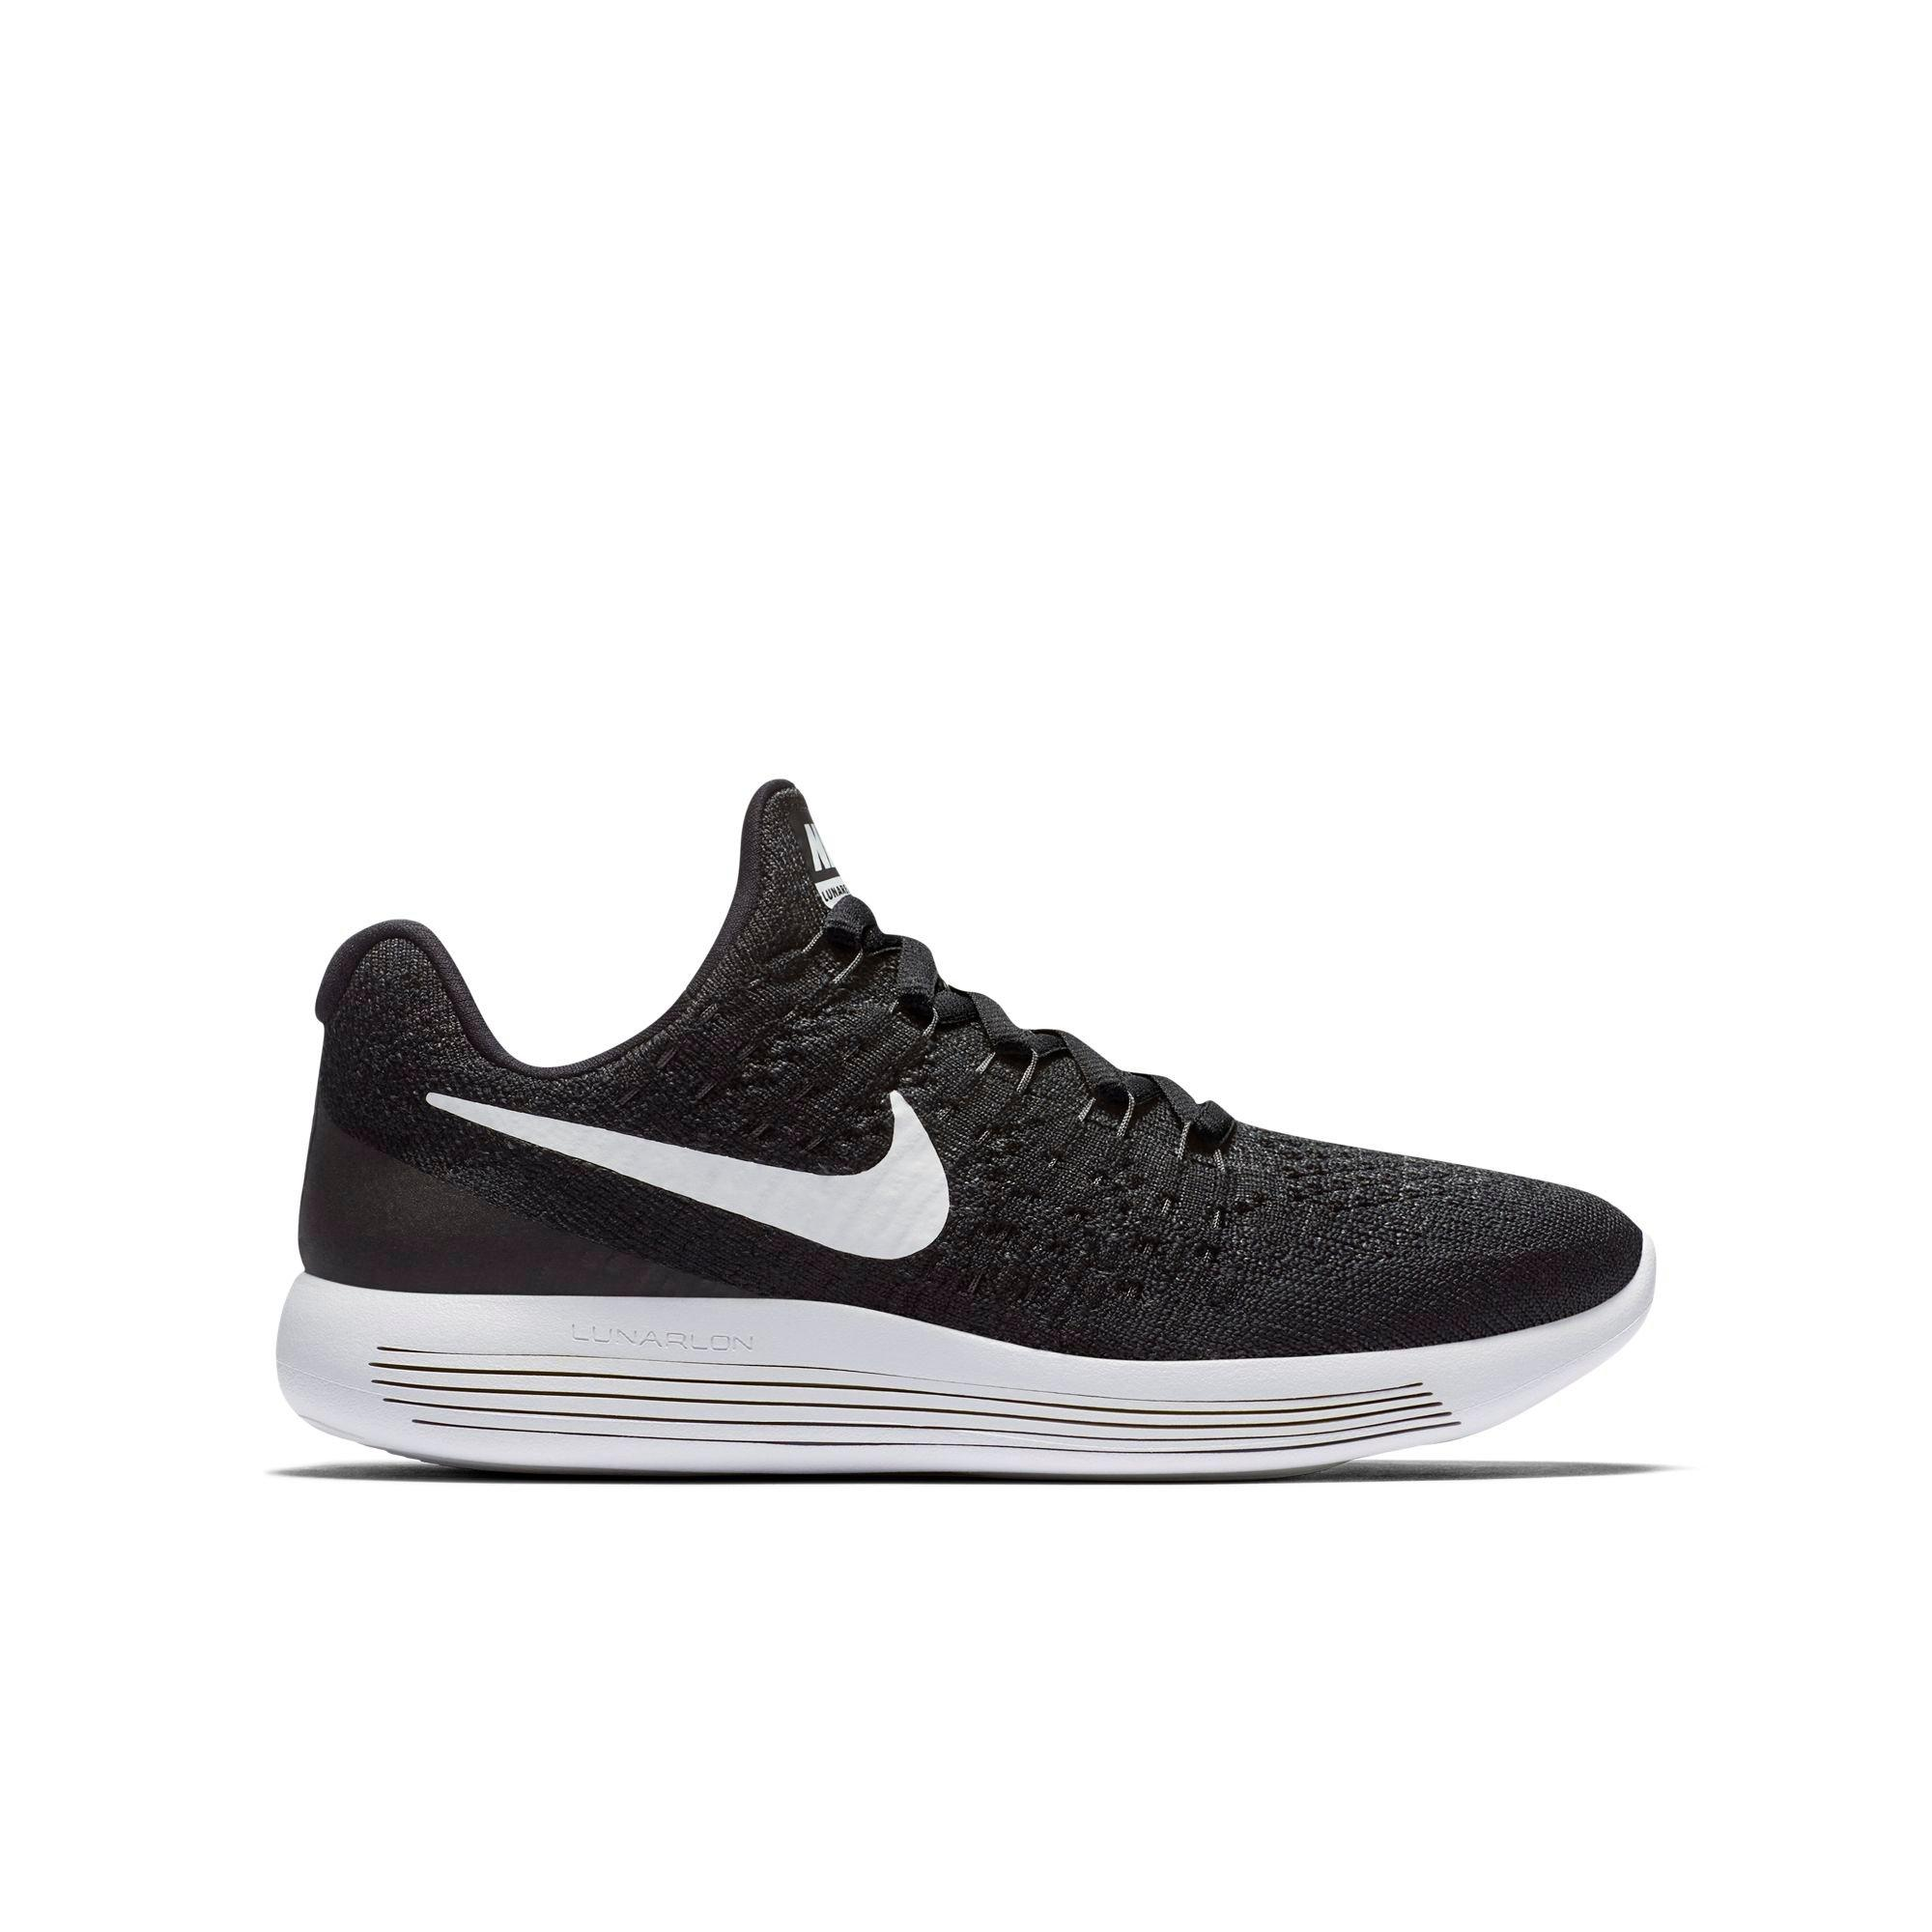 Taille Enfant 3 Nike Roshe